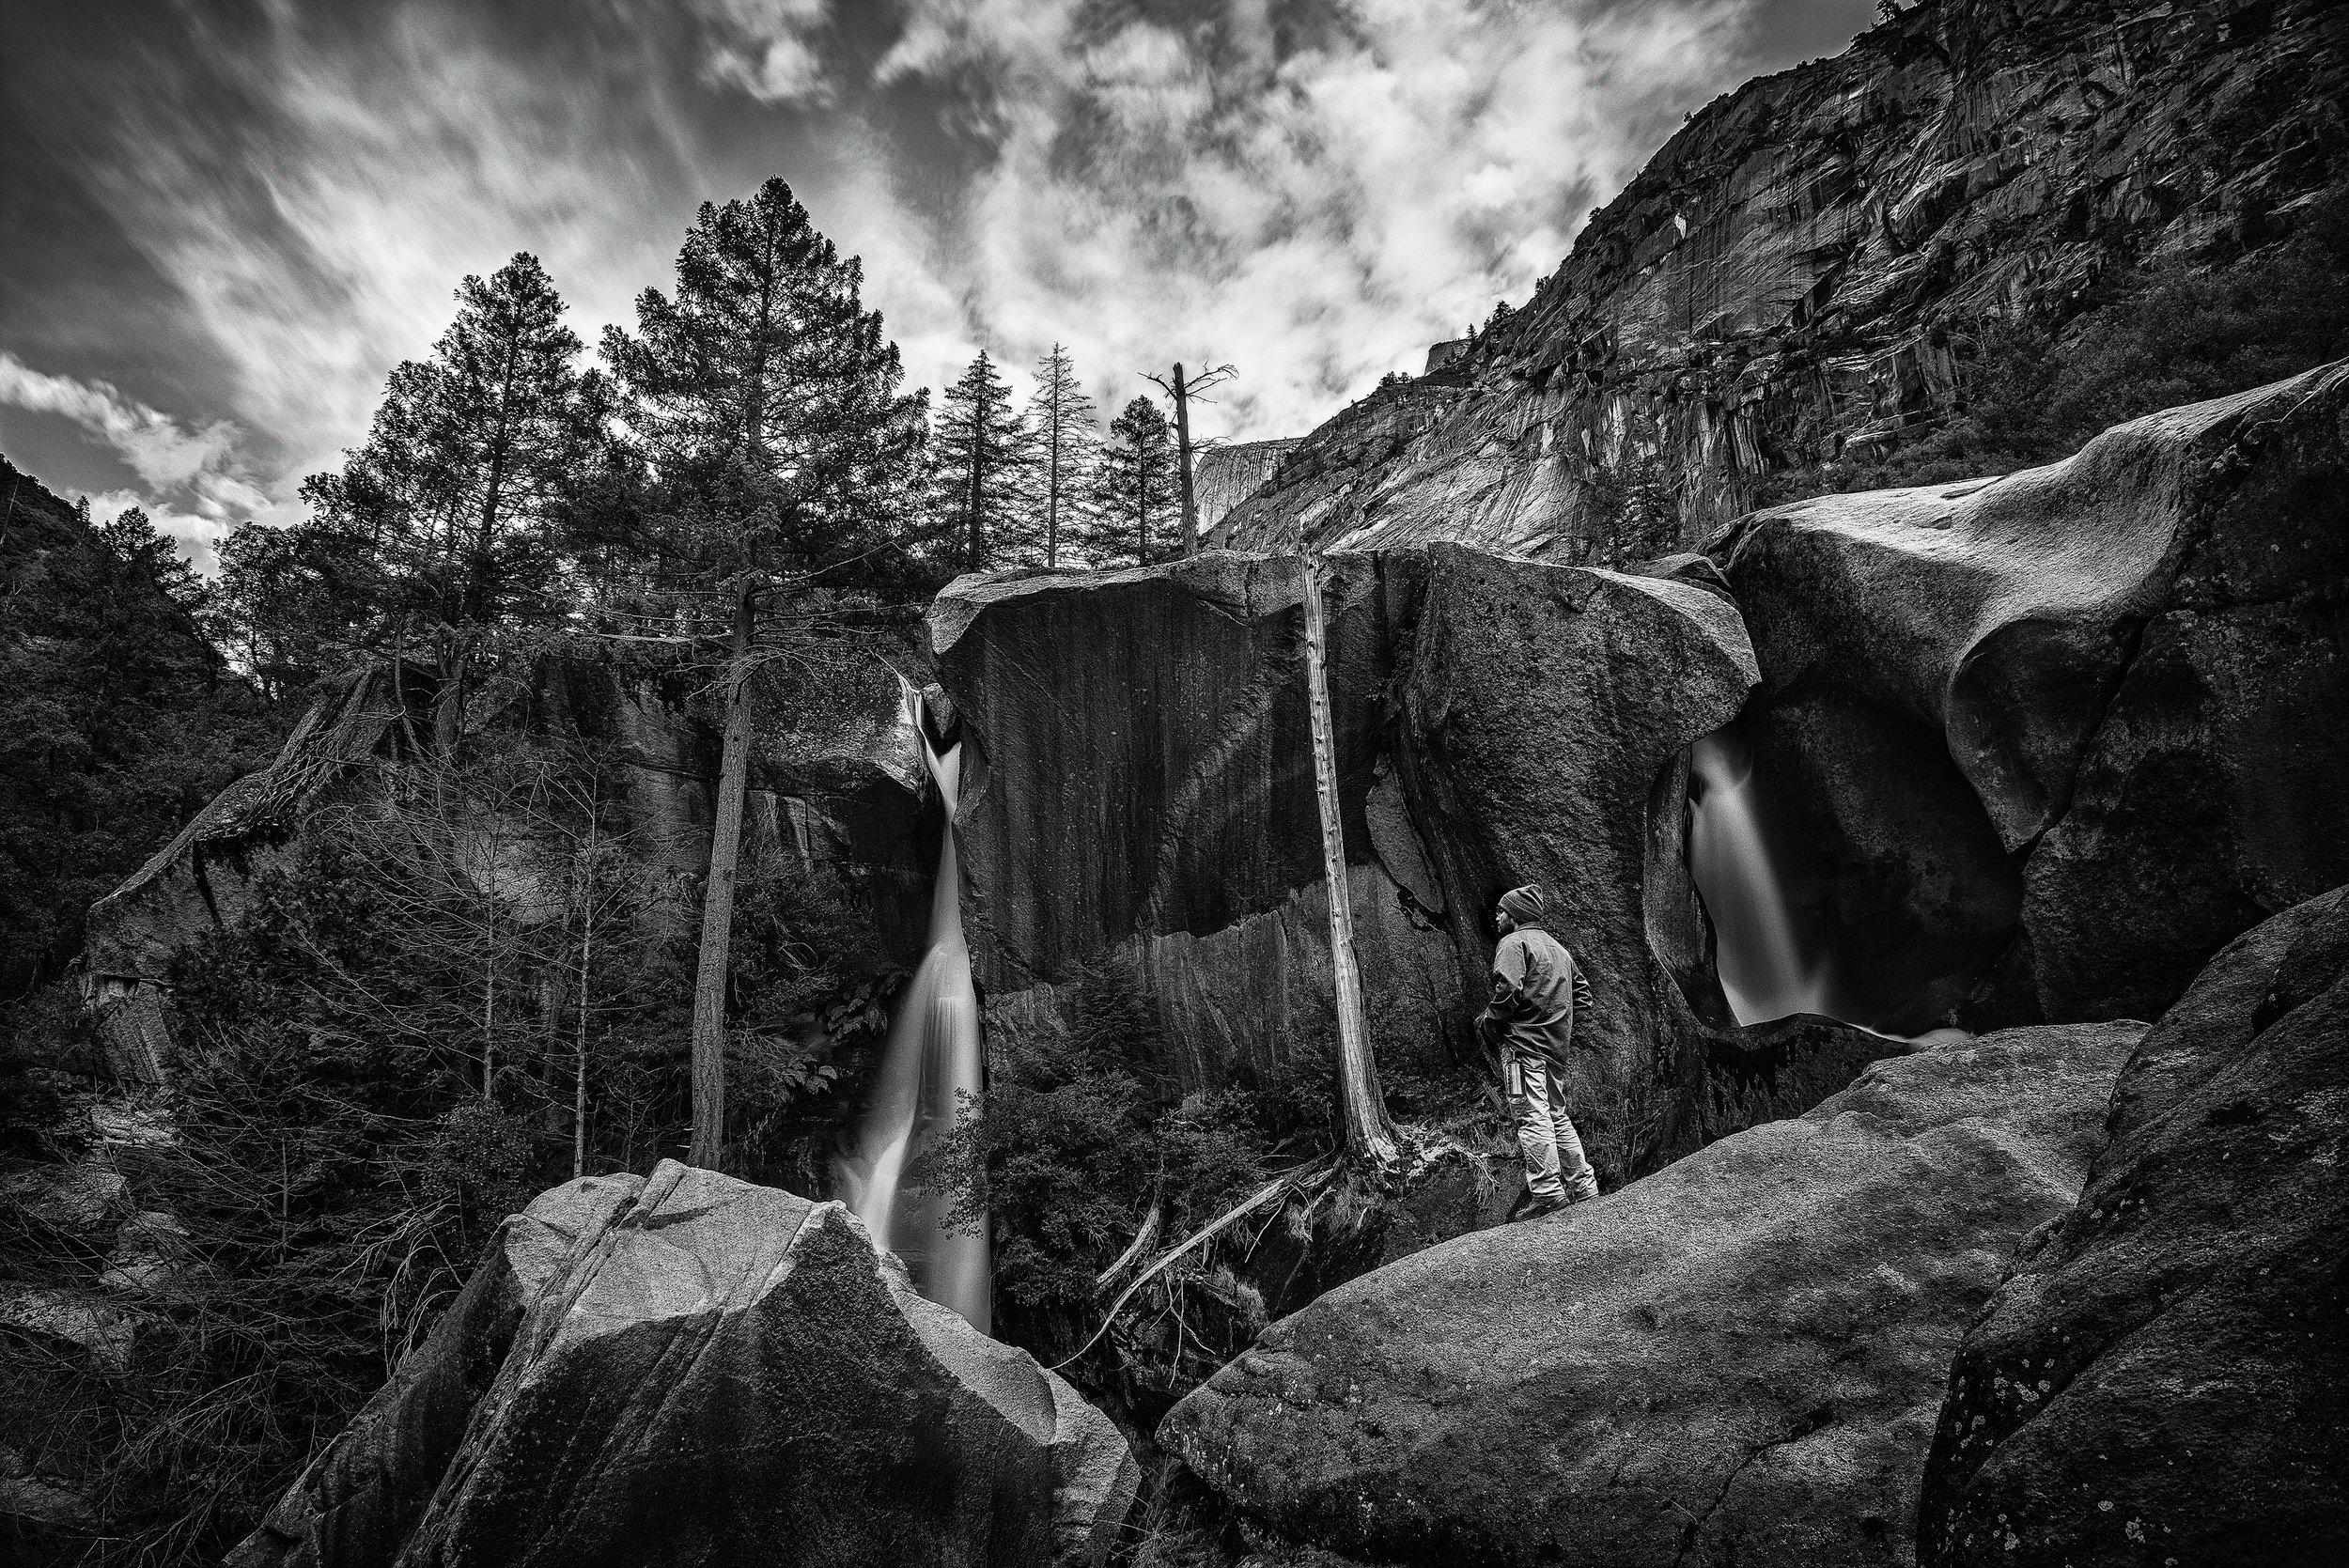 austin-trigg-yosemite-national-park-black-white-waterfall-Hidden-Falls-long-Exposure-hiking-adventure.jpg